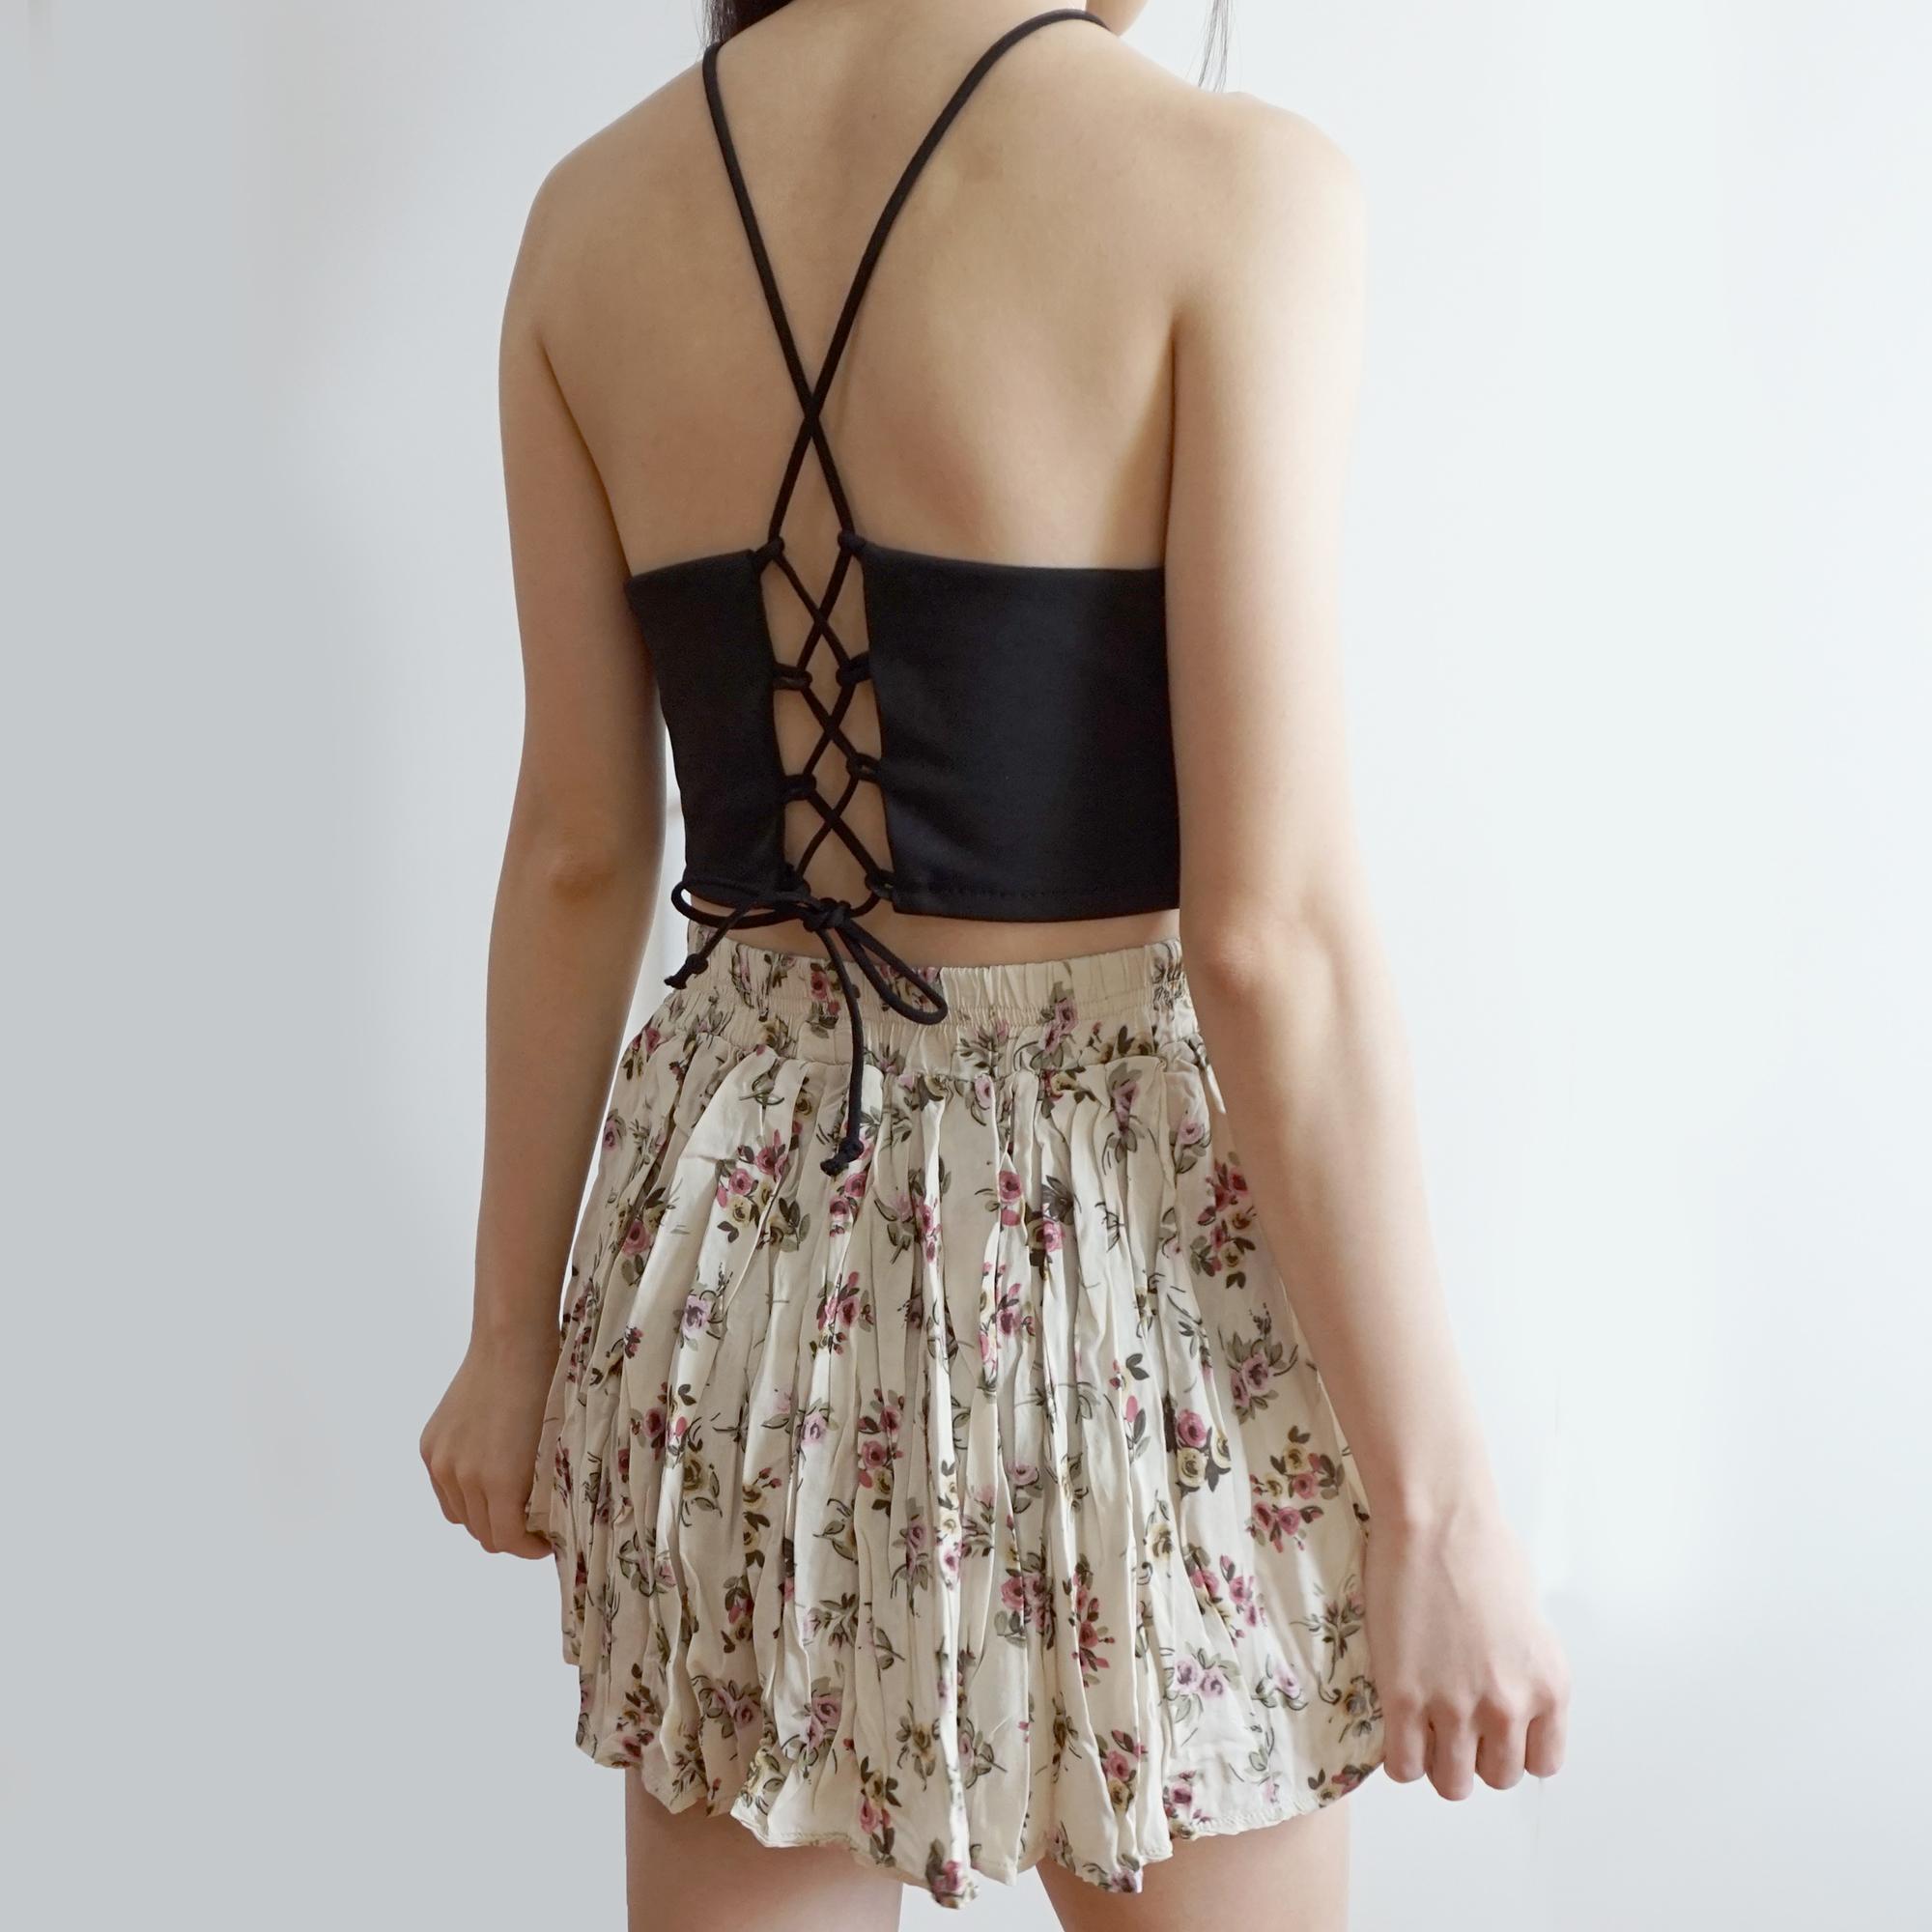 166221cabfe82 Crochet Cross Back Halter Crop Top (2 Colors) · Megoosta Fashion ...